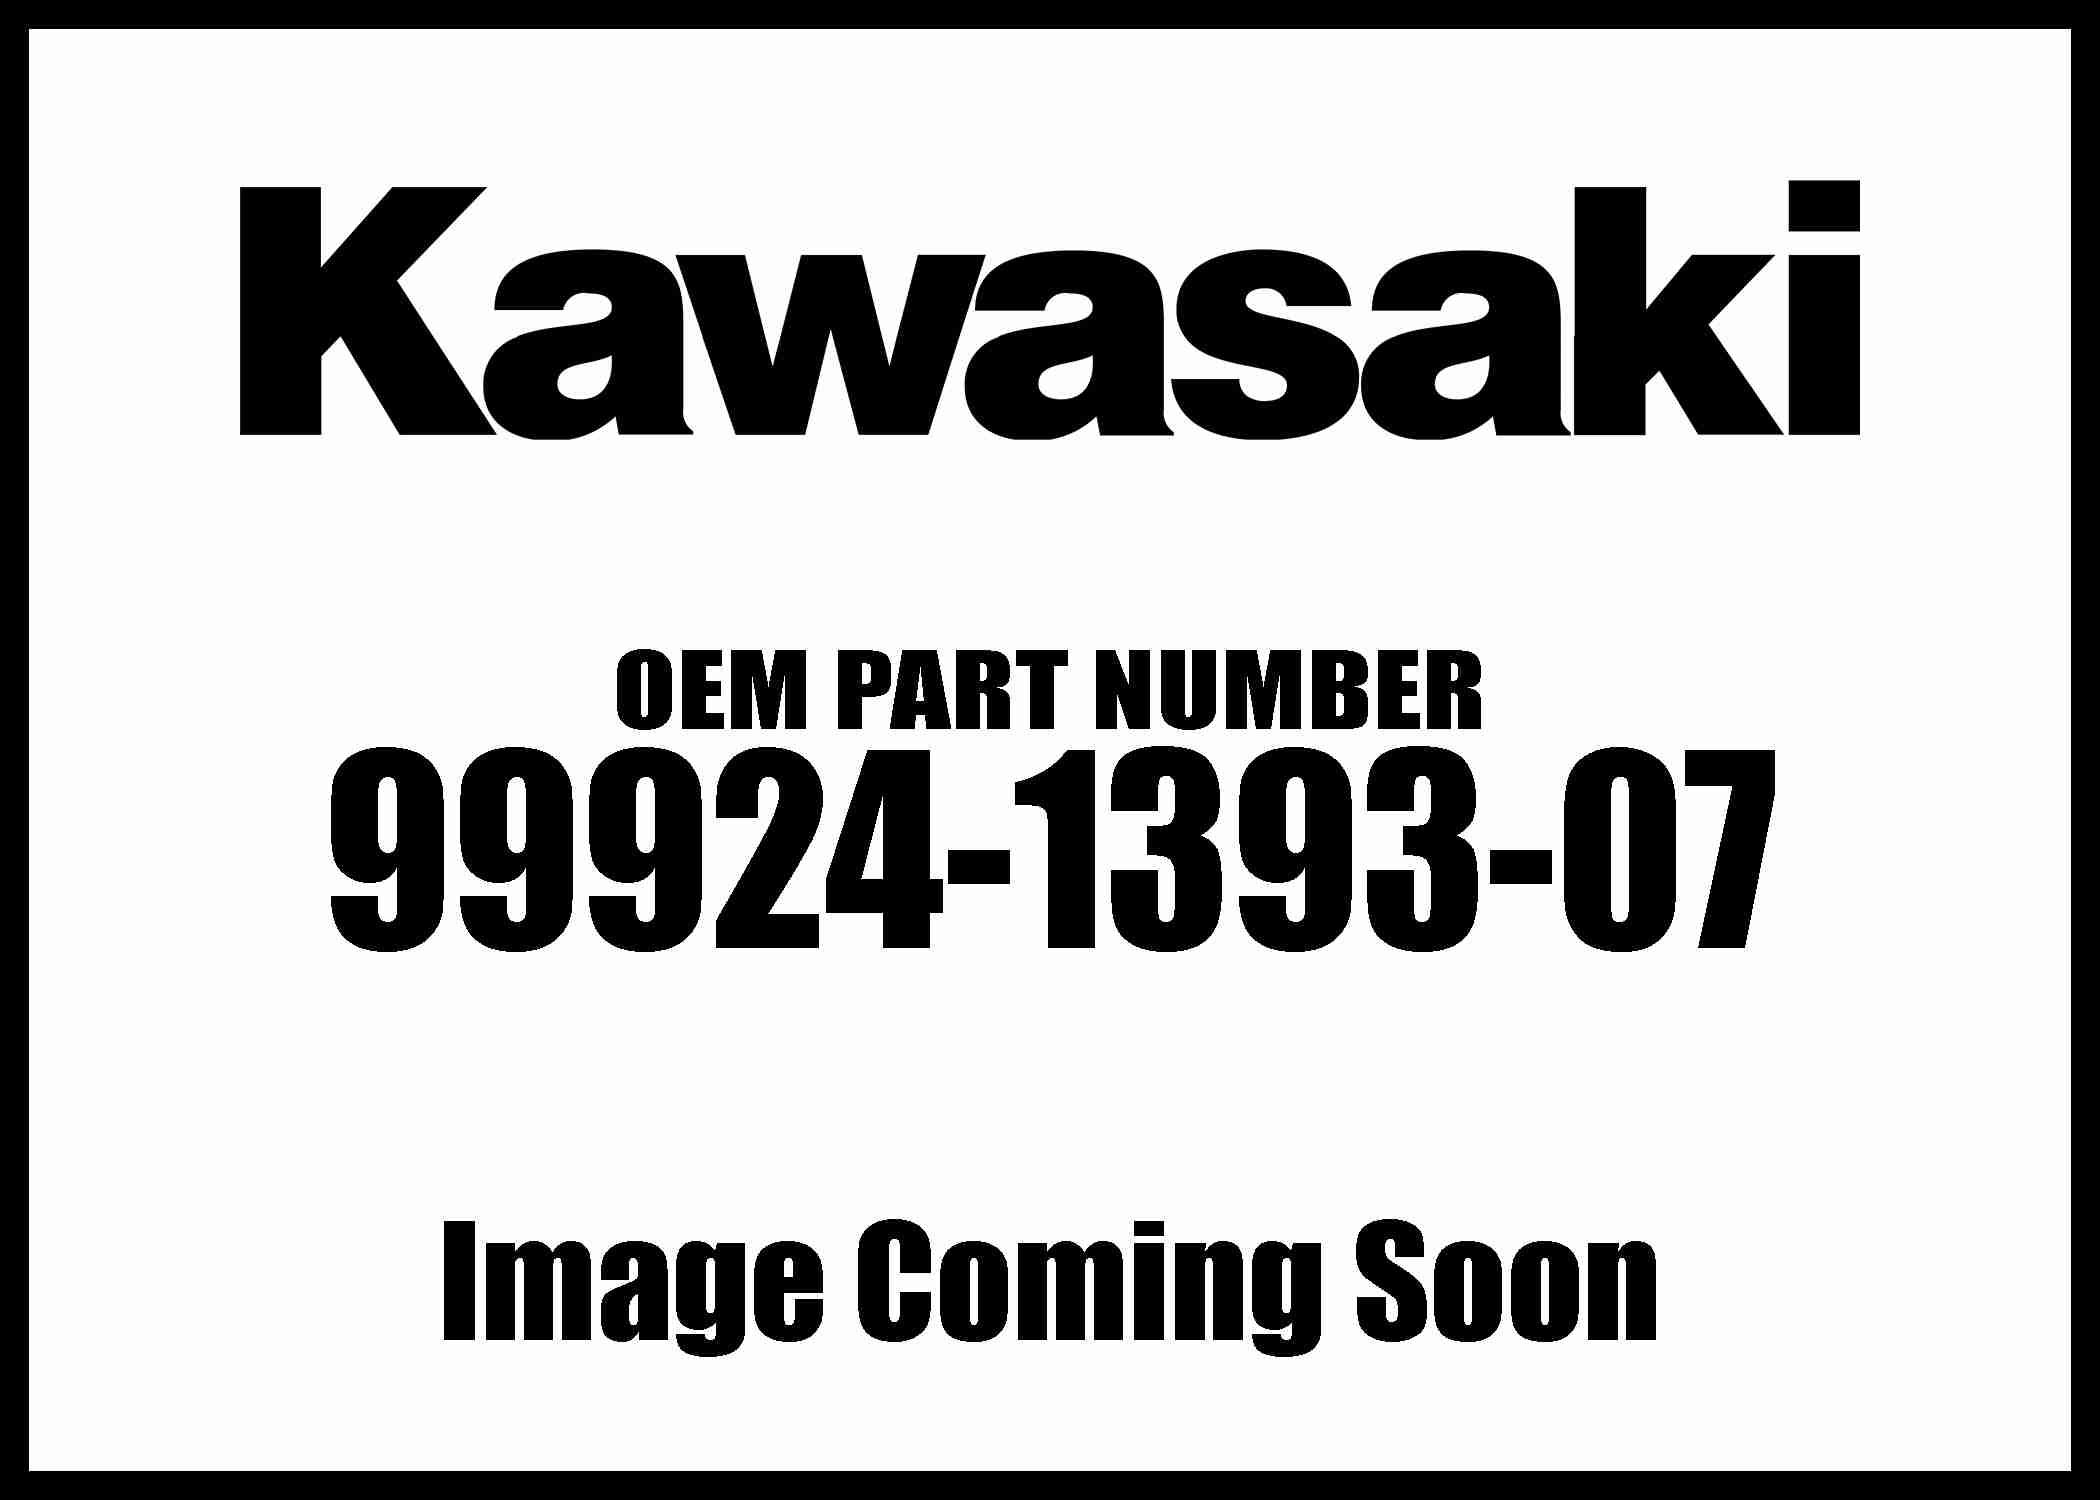 Kawasaki 2009-2013 Klx250s Klx250sf S/M Klx250t 99924-1393